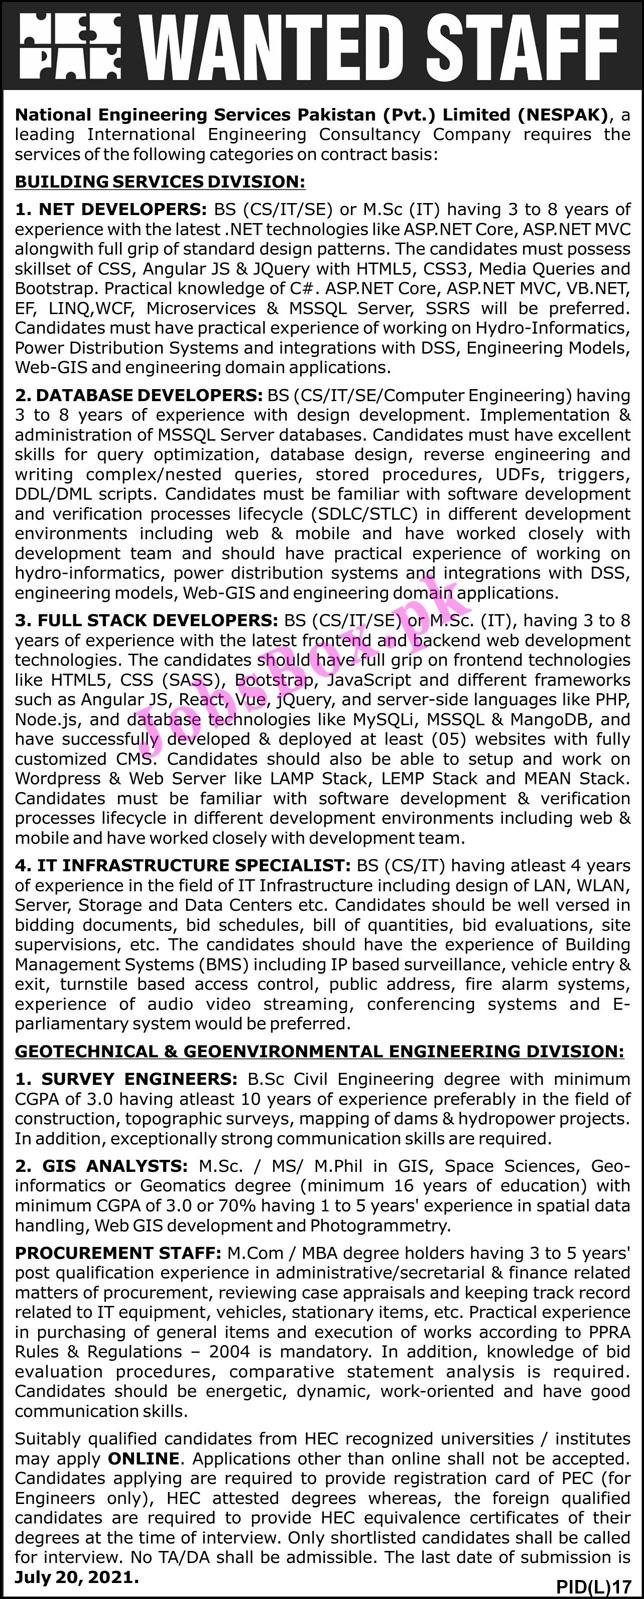 www.nespak.com.pk Jobs 2021 - National Engineering Services Pakistan NESPAK Jobs 2021 in Pakistan